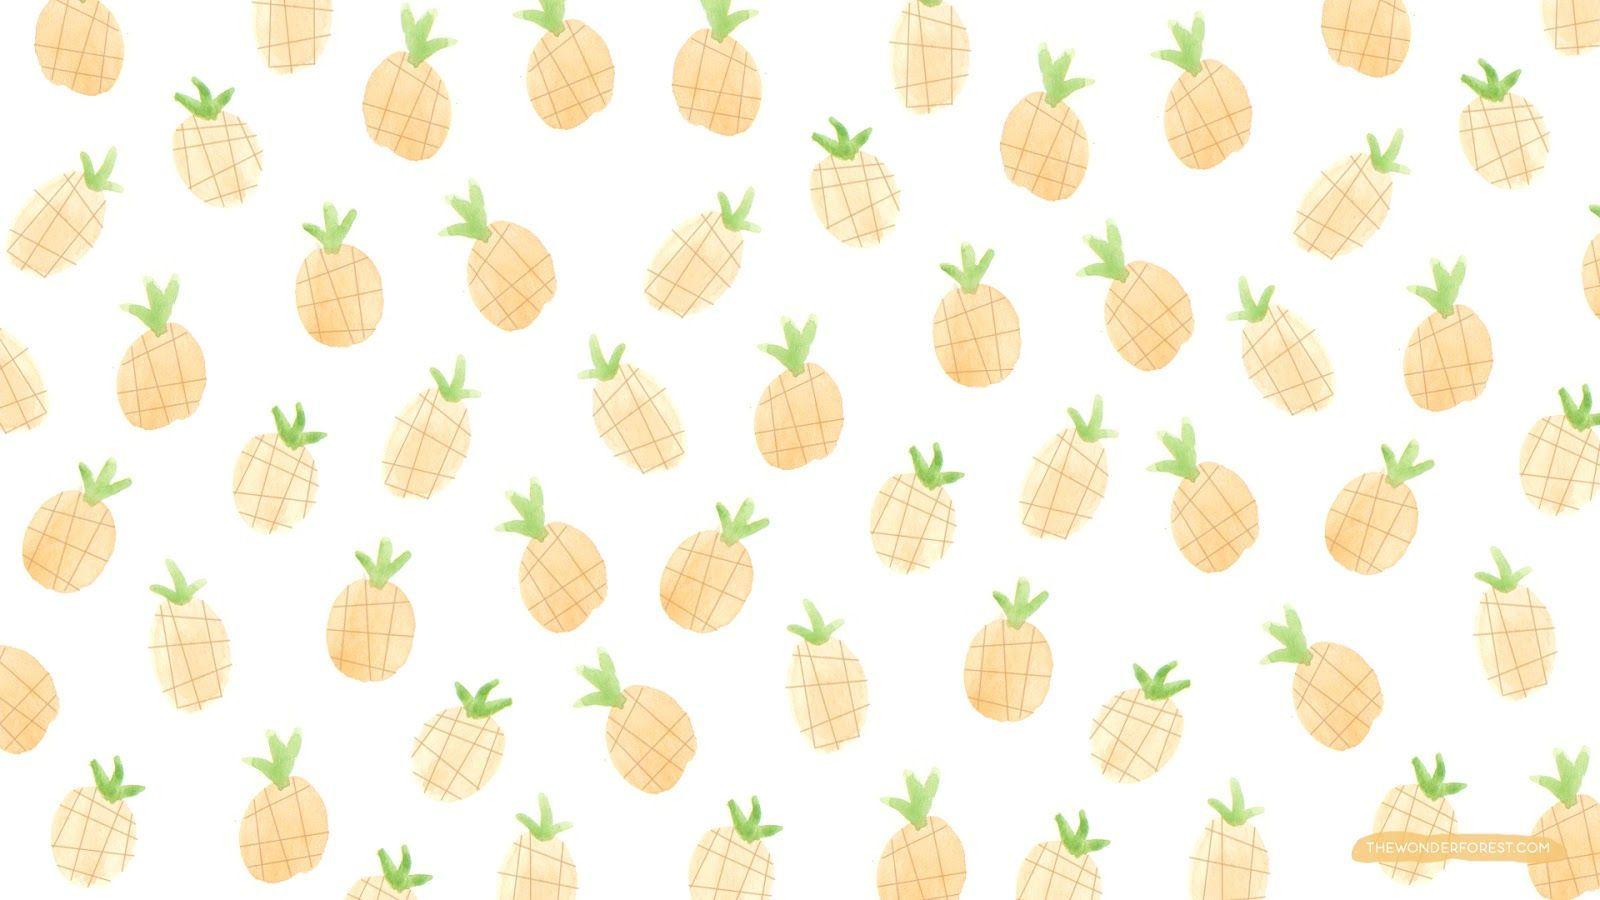 Fruity Iphone And Desktop Wallpapers Wonder Forest Pineapple Wallpaper Watercolor Desktop Wallpaper Cute Pineapple Wallpaper